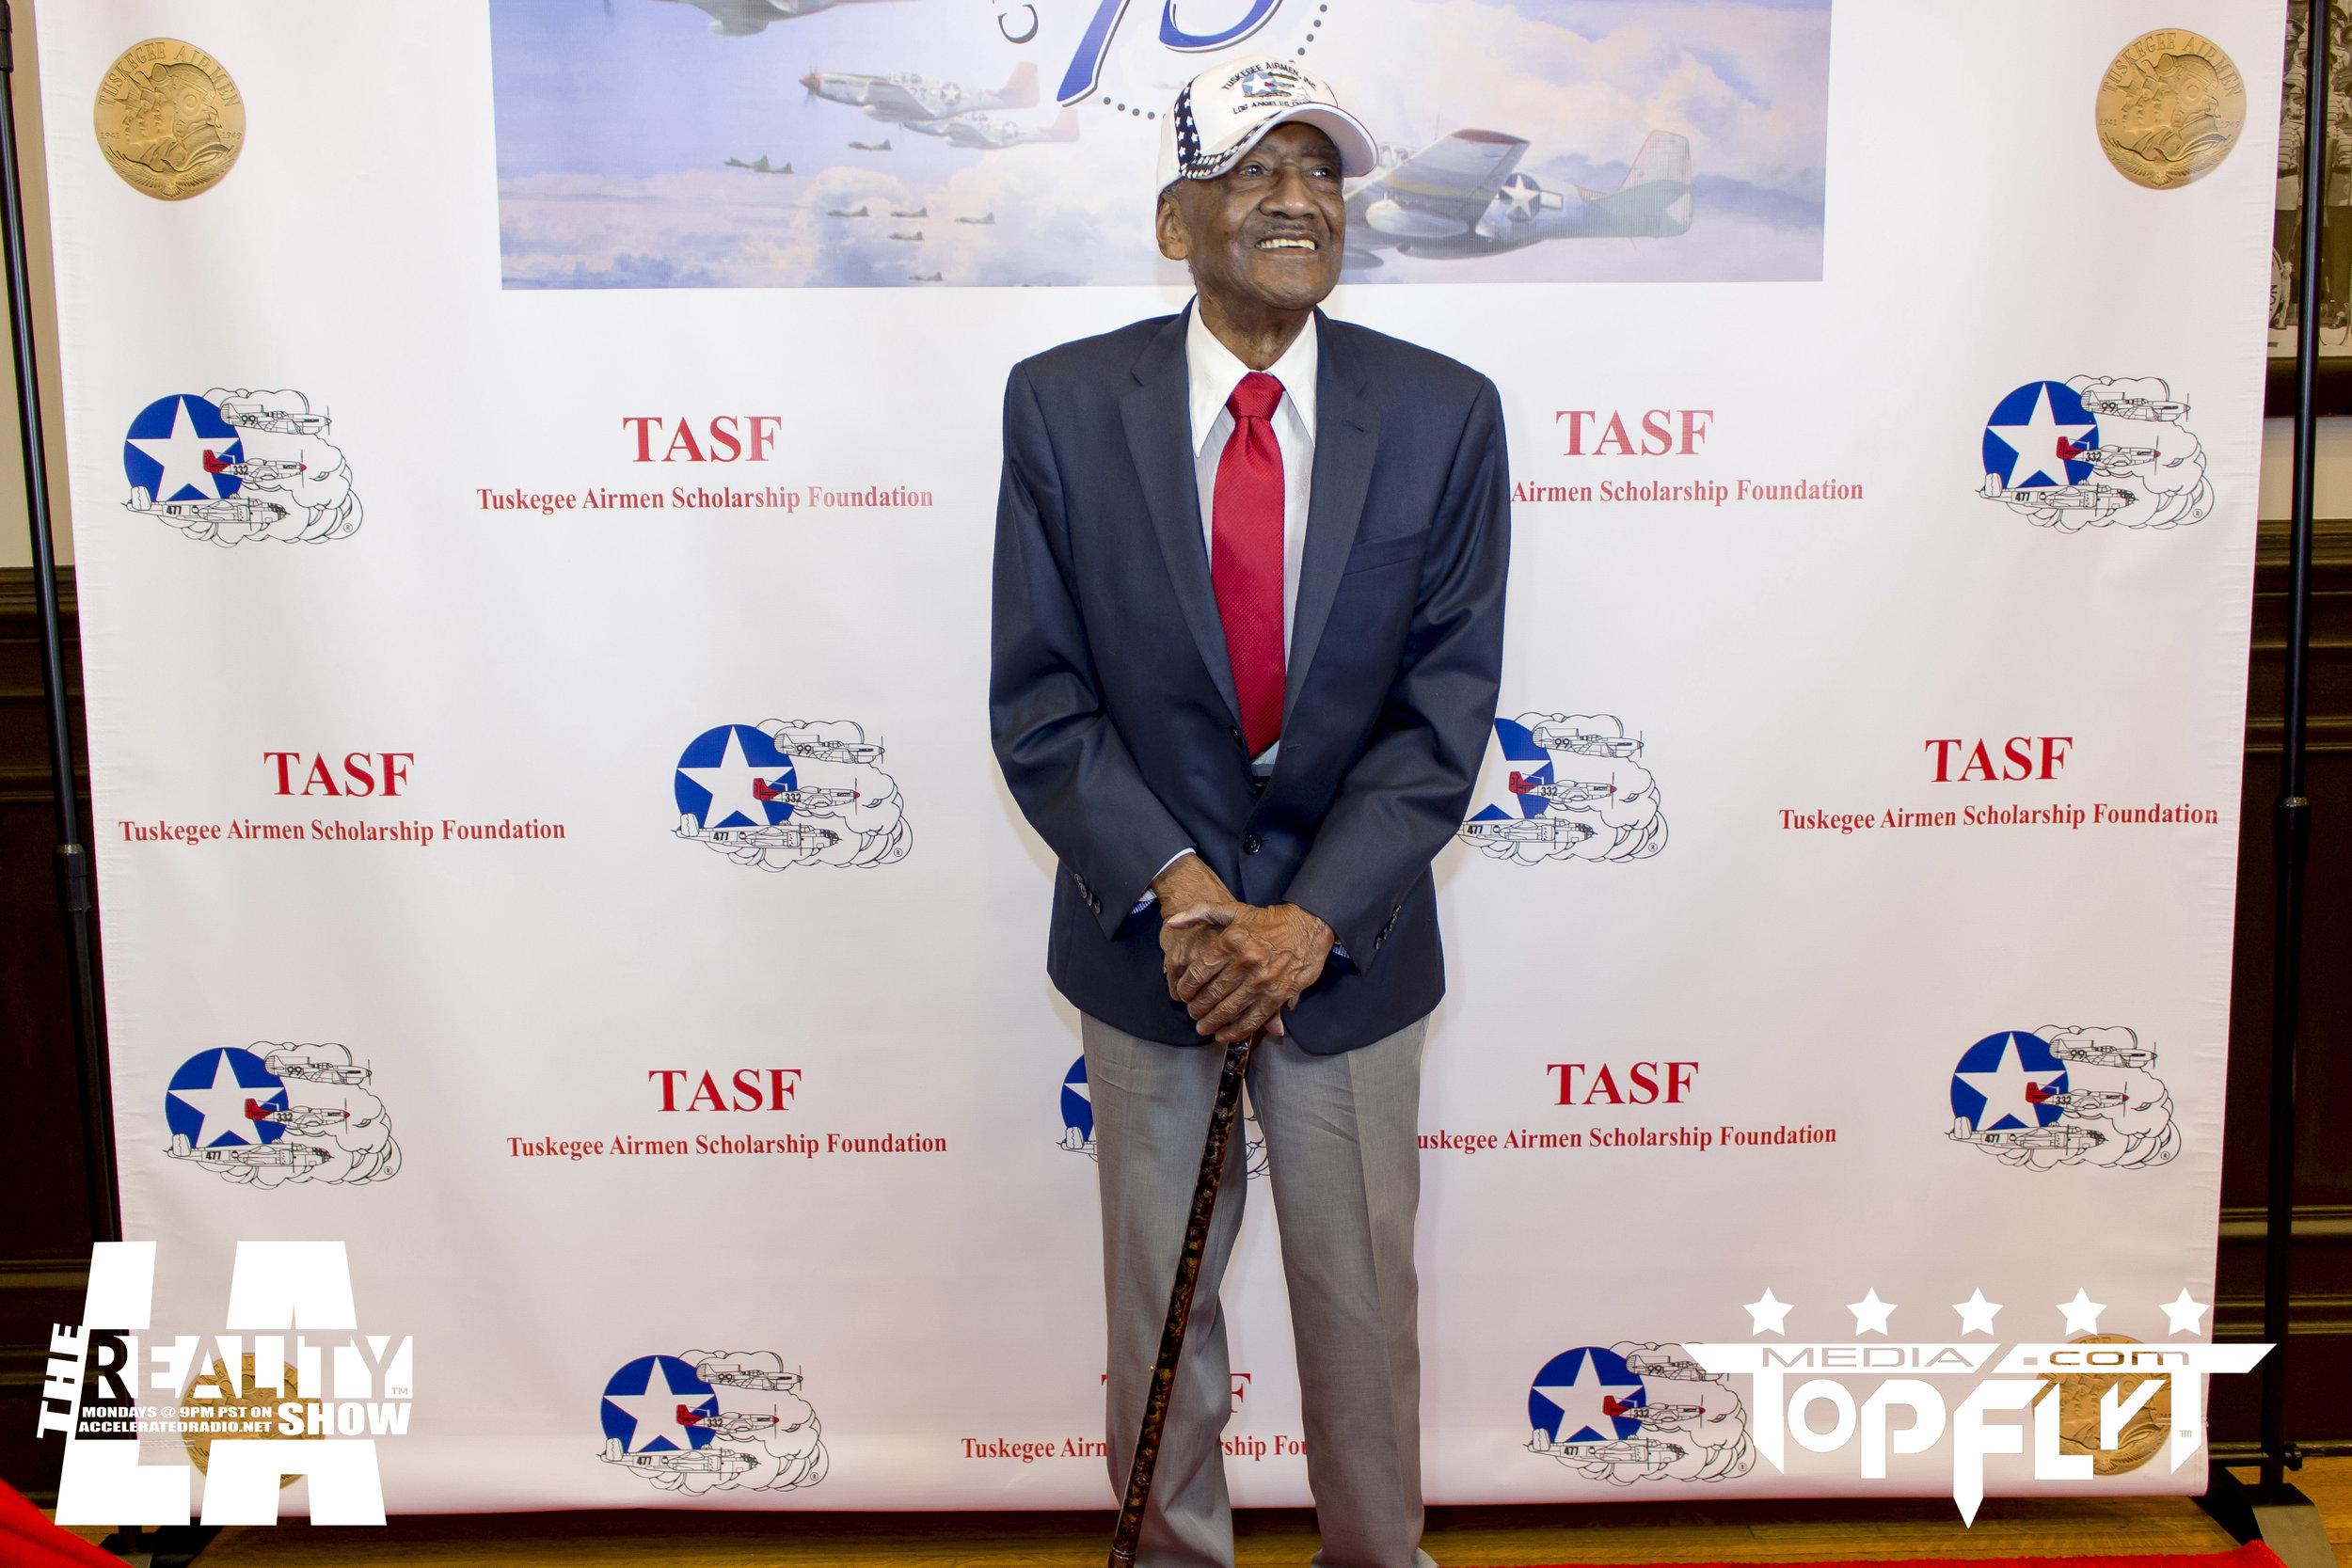 The Reality Show LA - Tuskegee Airmen 75th Anniversary VIP Reception_10.jpg